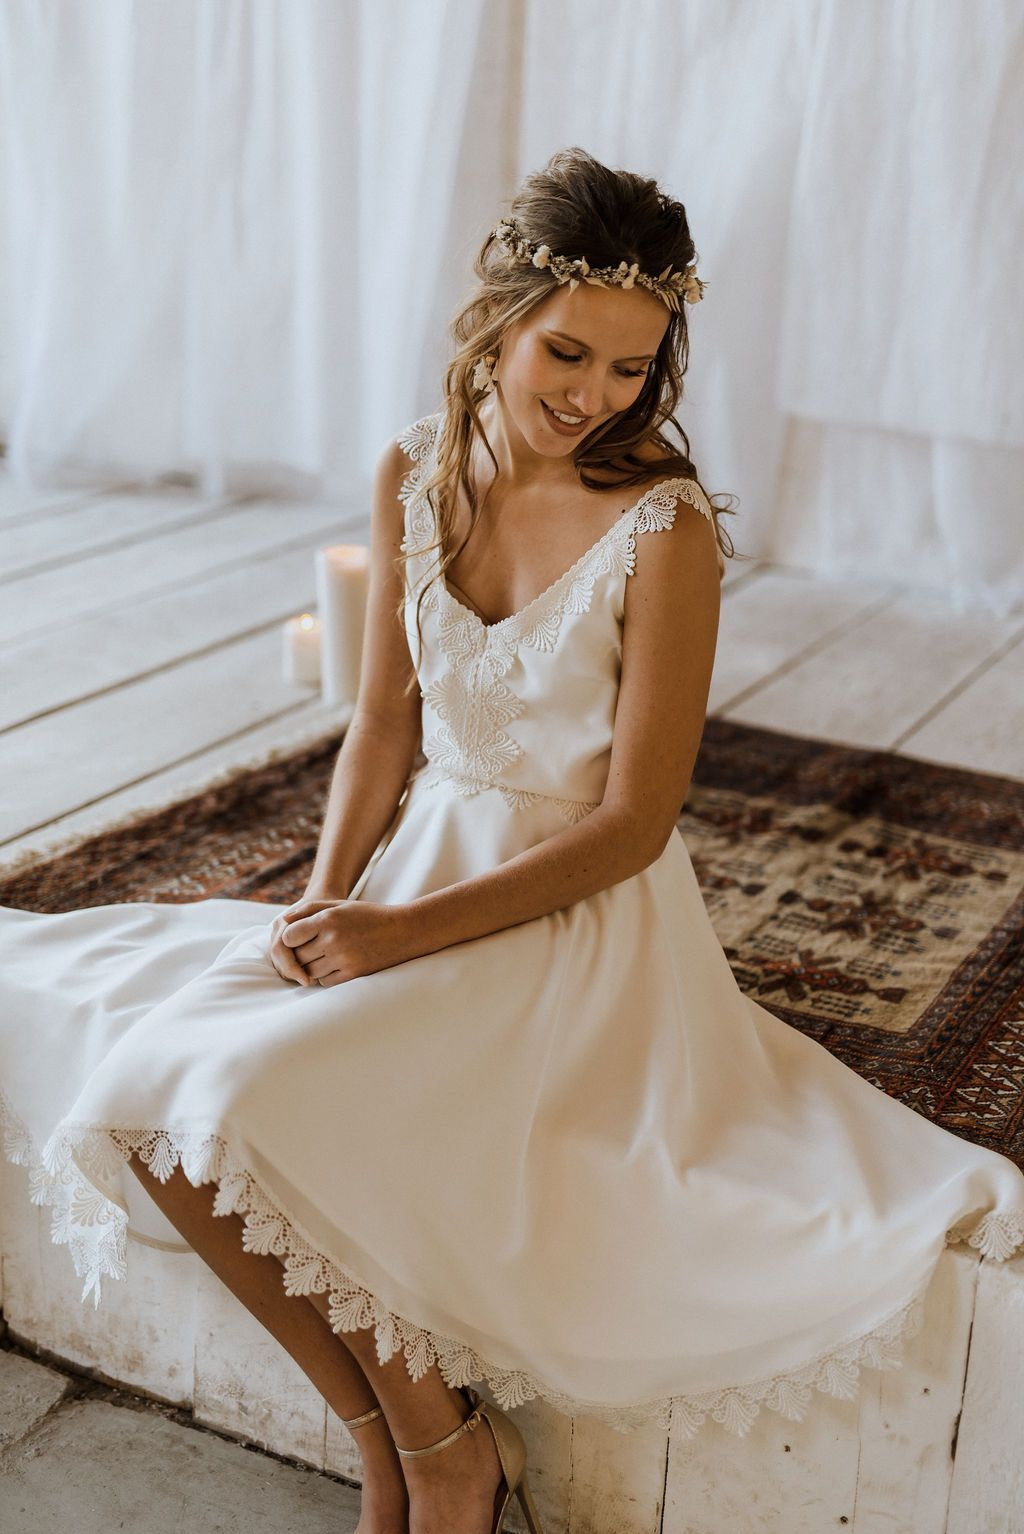 Vestidos de novia cortos – Labude Brautmode Köln  – Peinados  – Boda